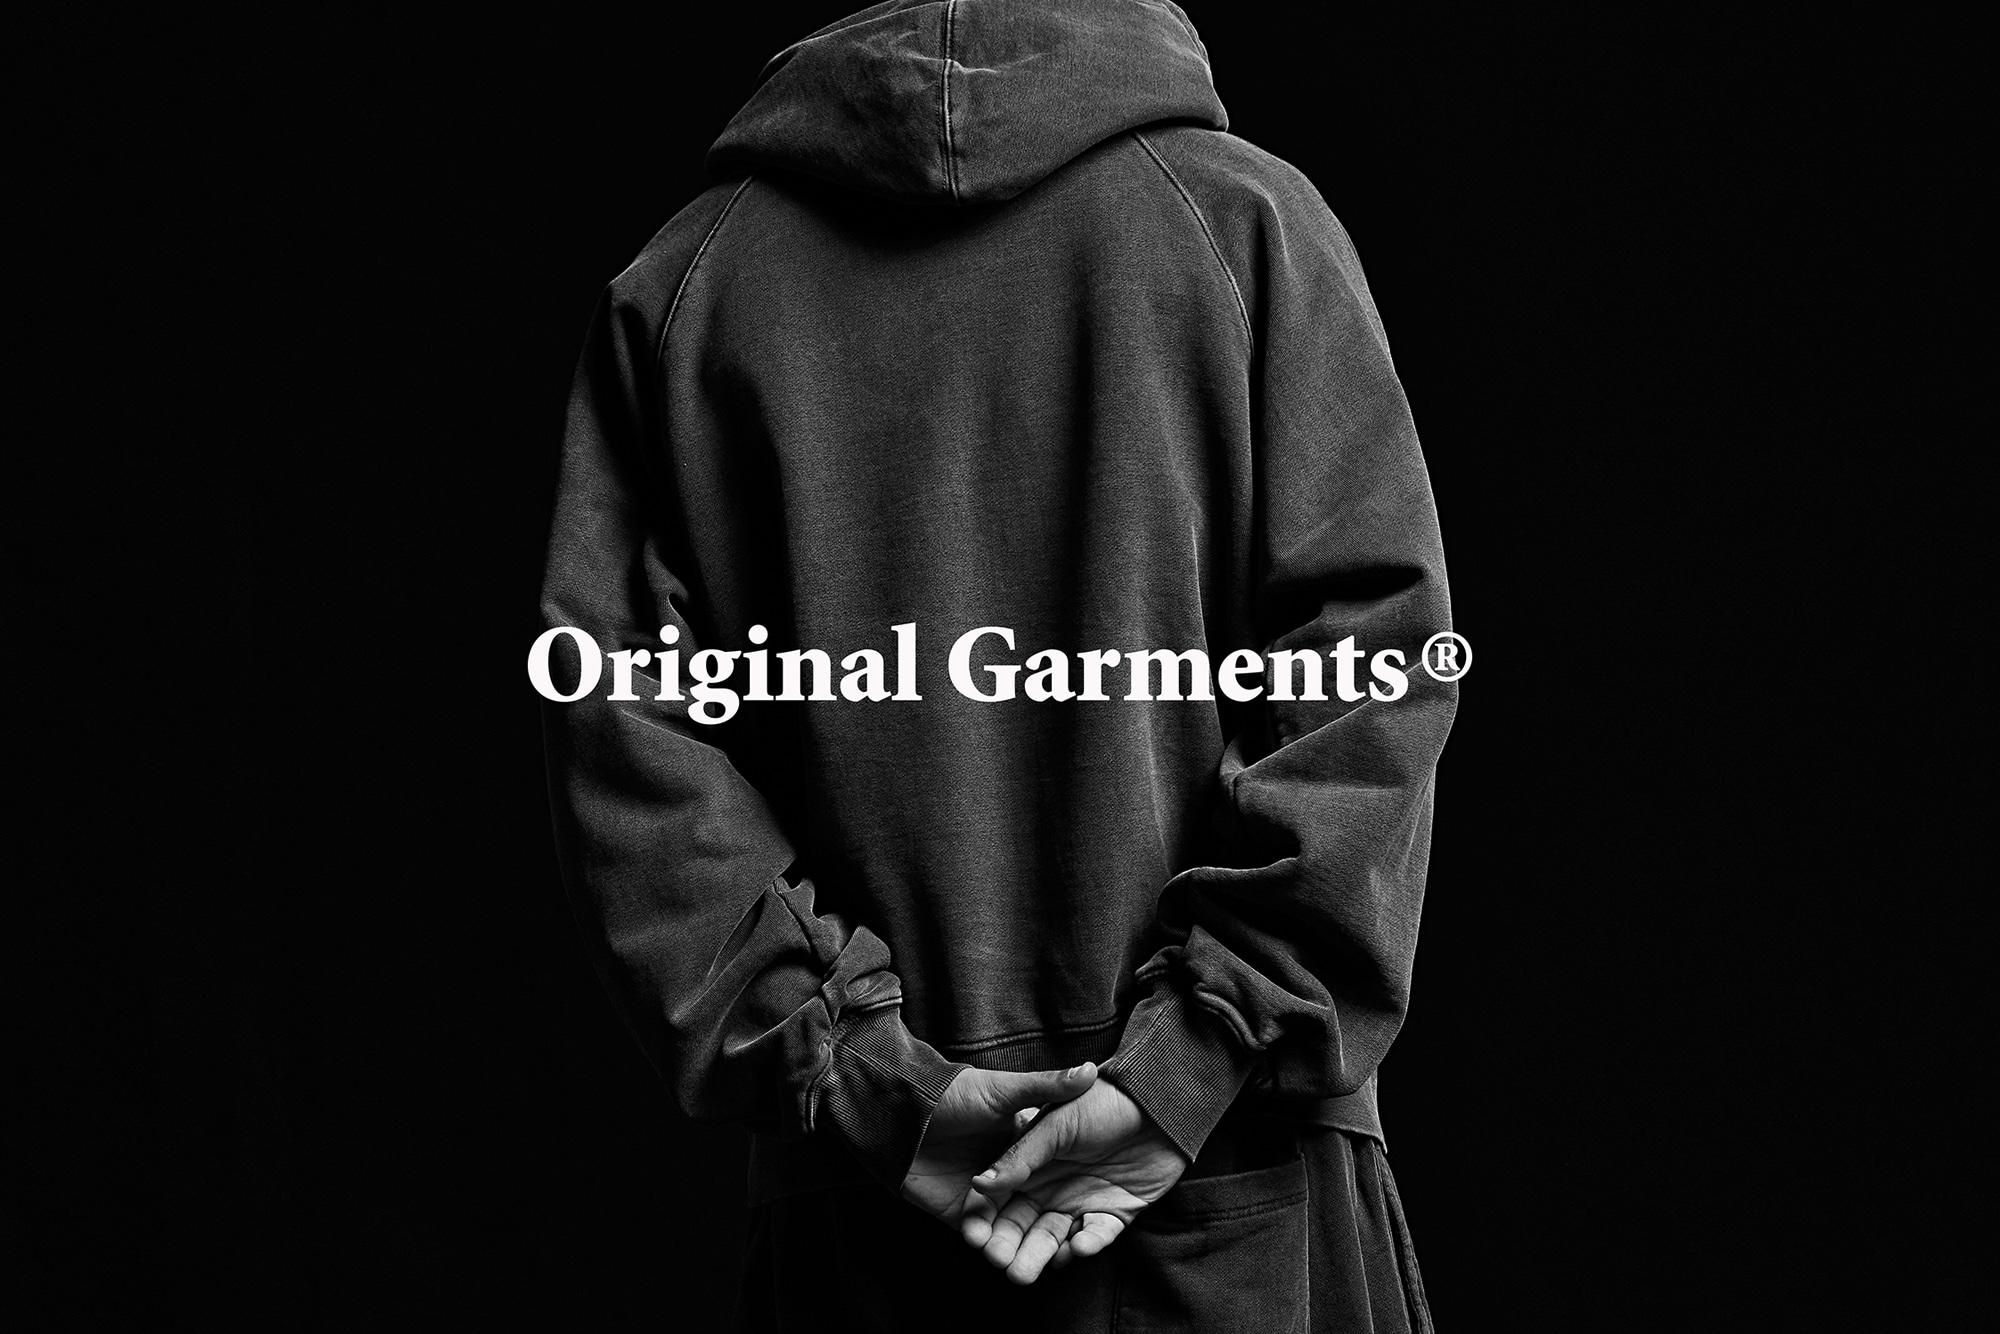 Original Garments® 2021 Collection Lookbook